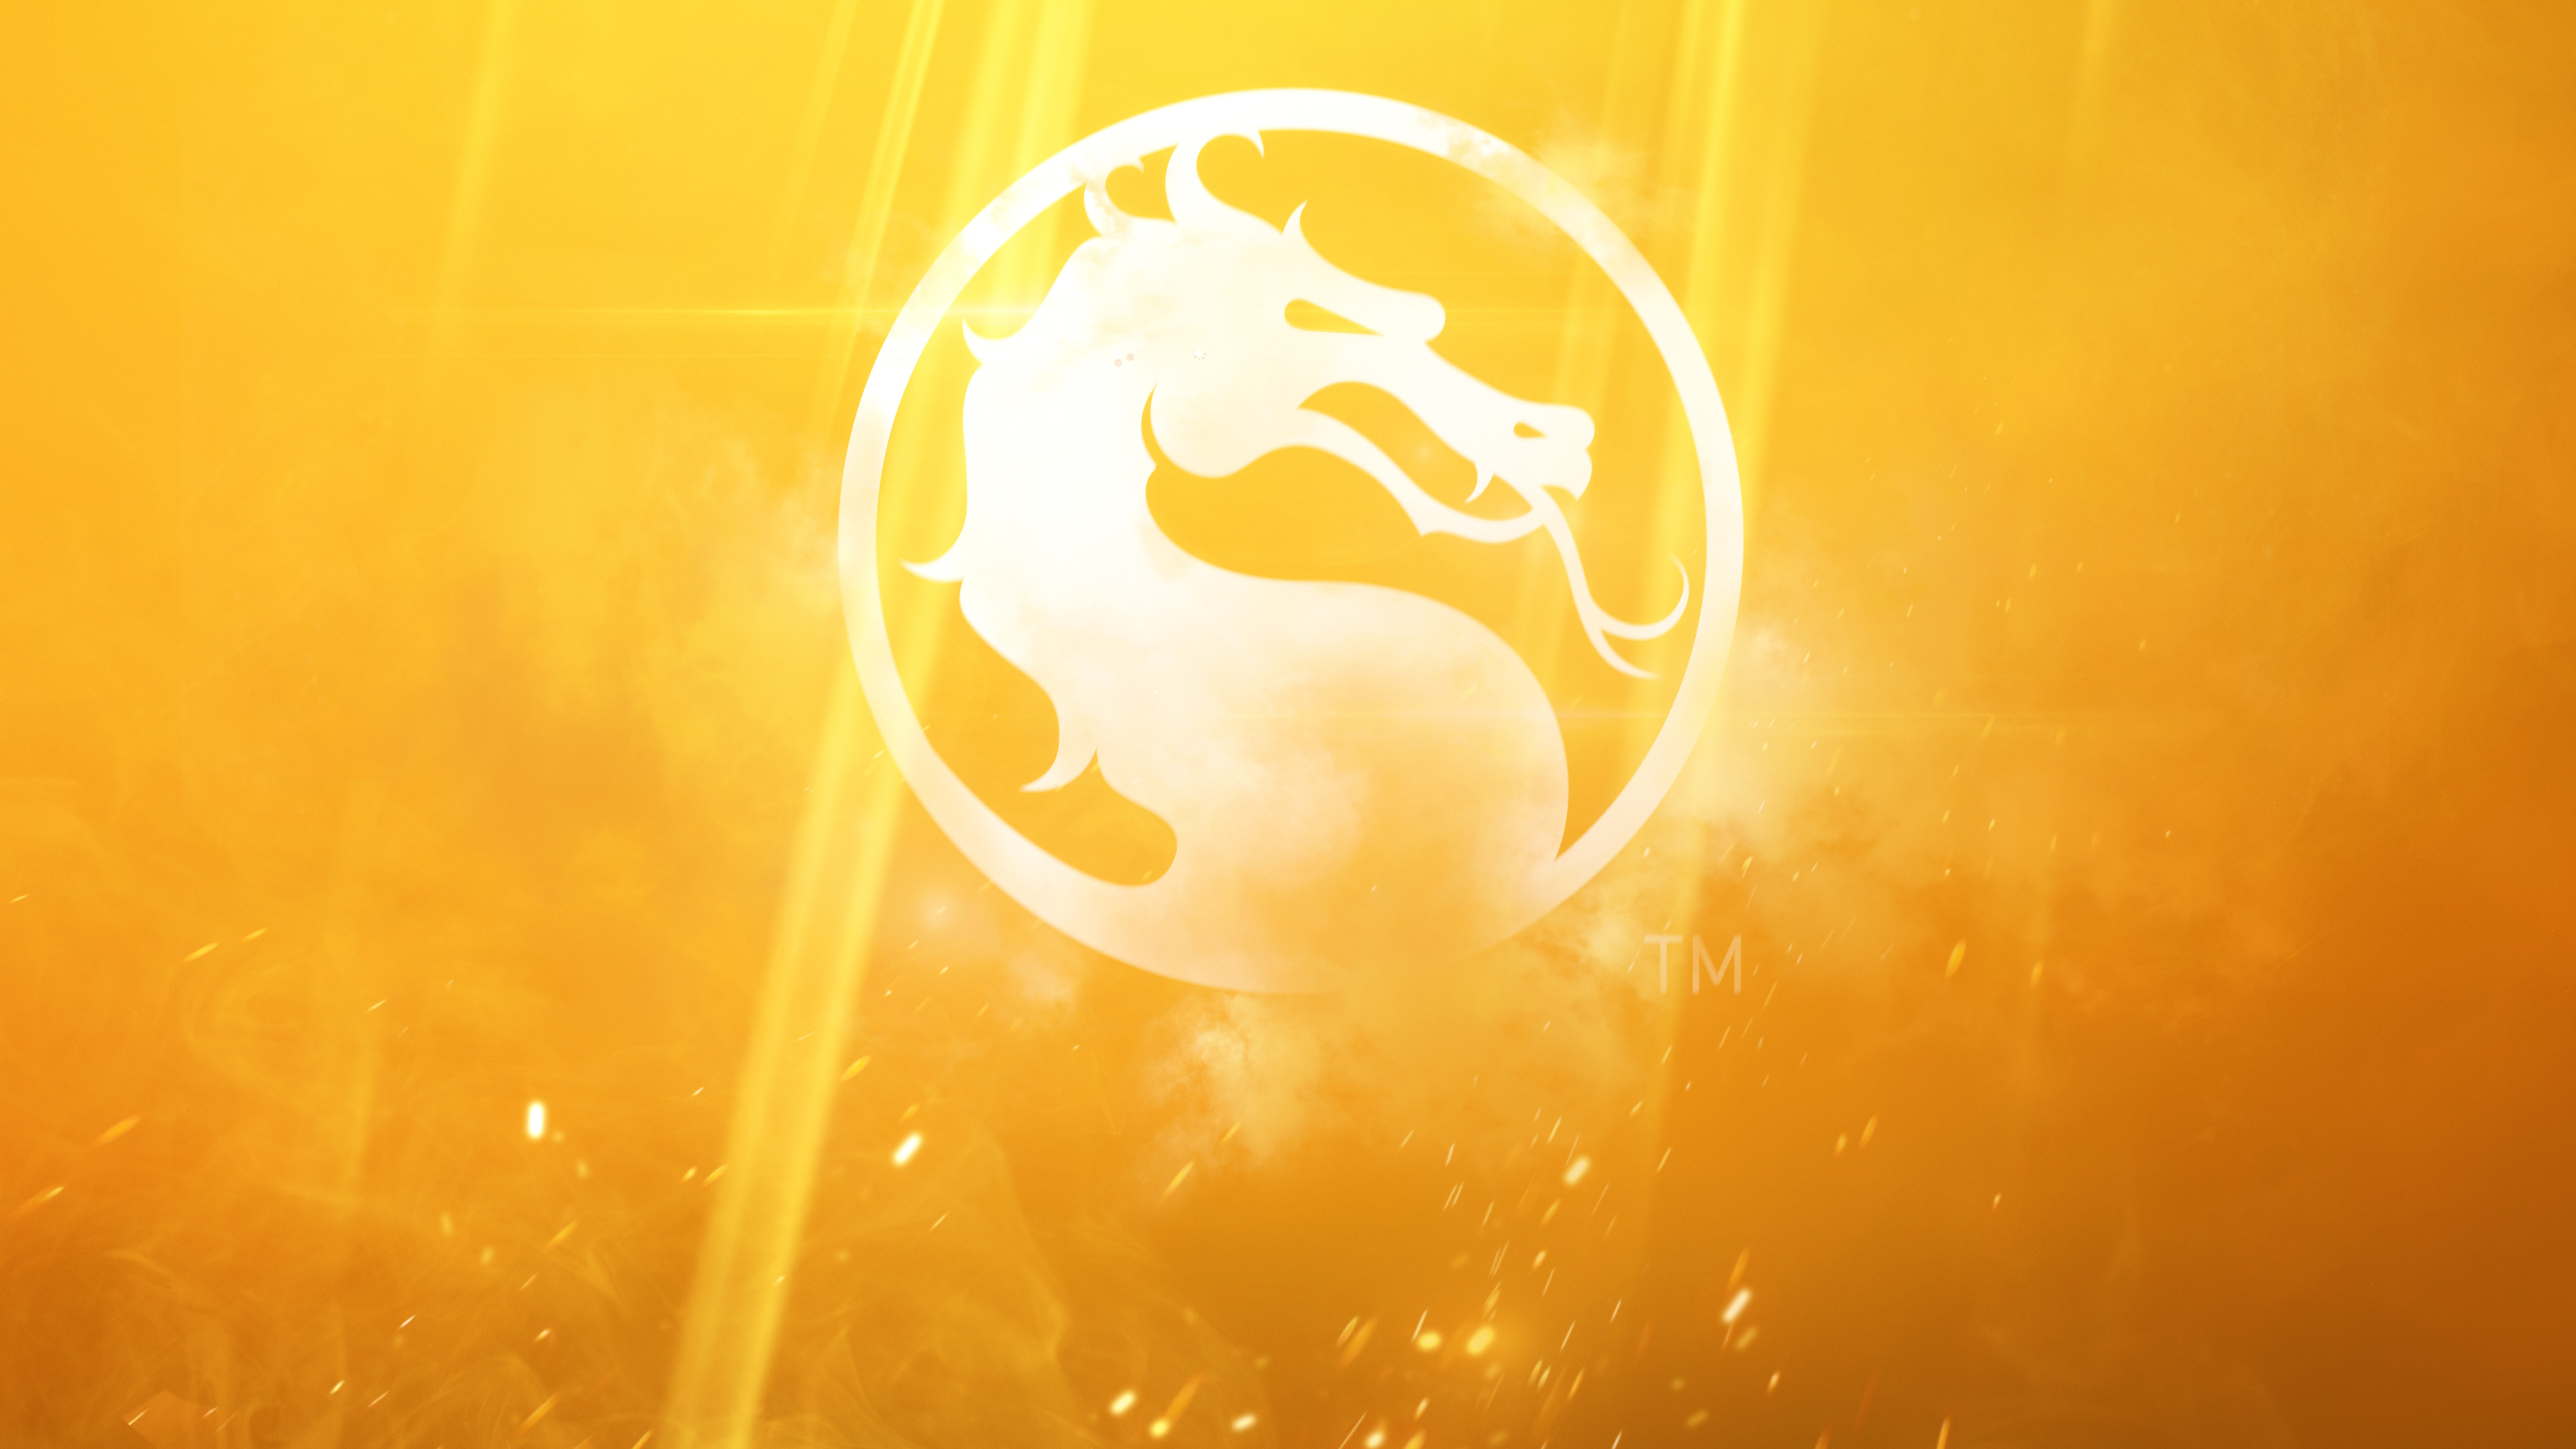 Wallpaper 4k Mortal Kombat 11 Logo 2019 Games Wallpapers 4k